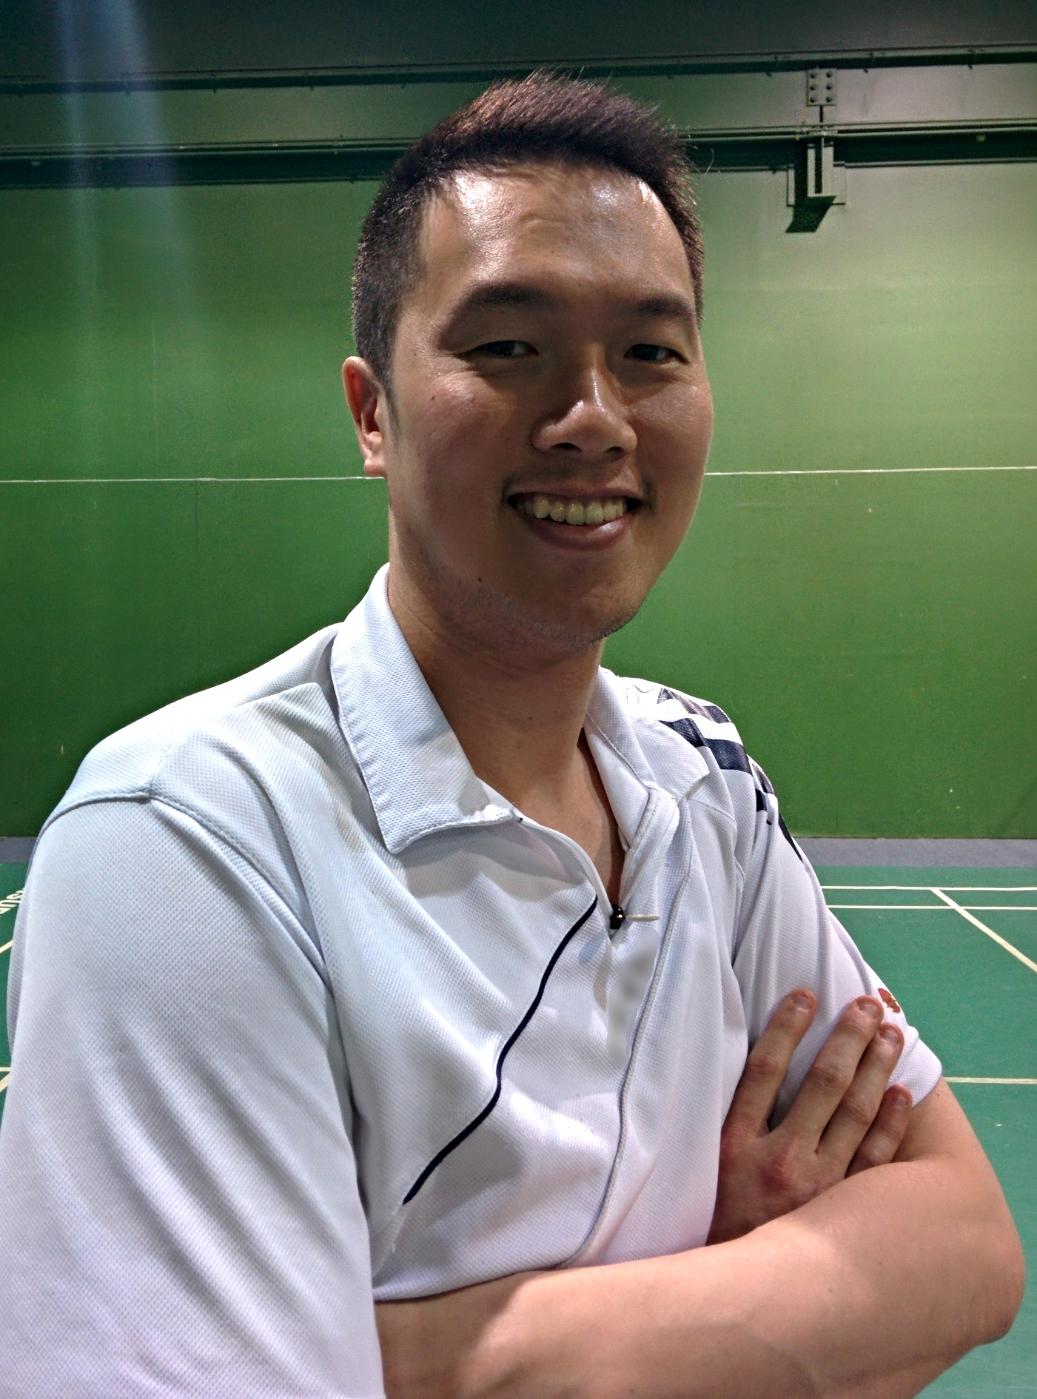 Allen Sutedja,   Coach of Suria Badminton Centre